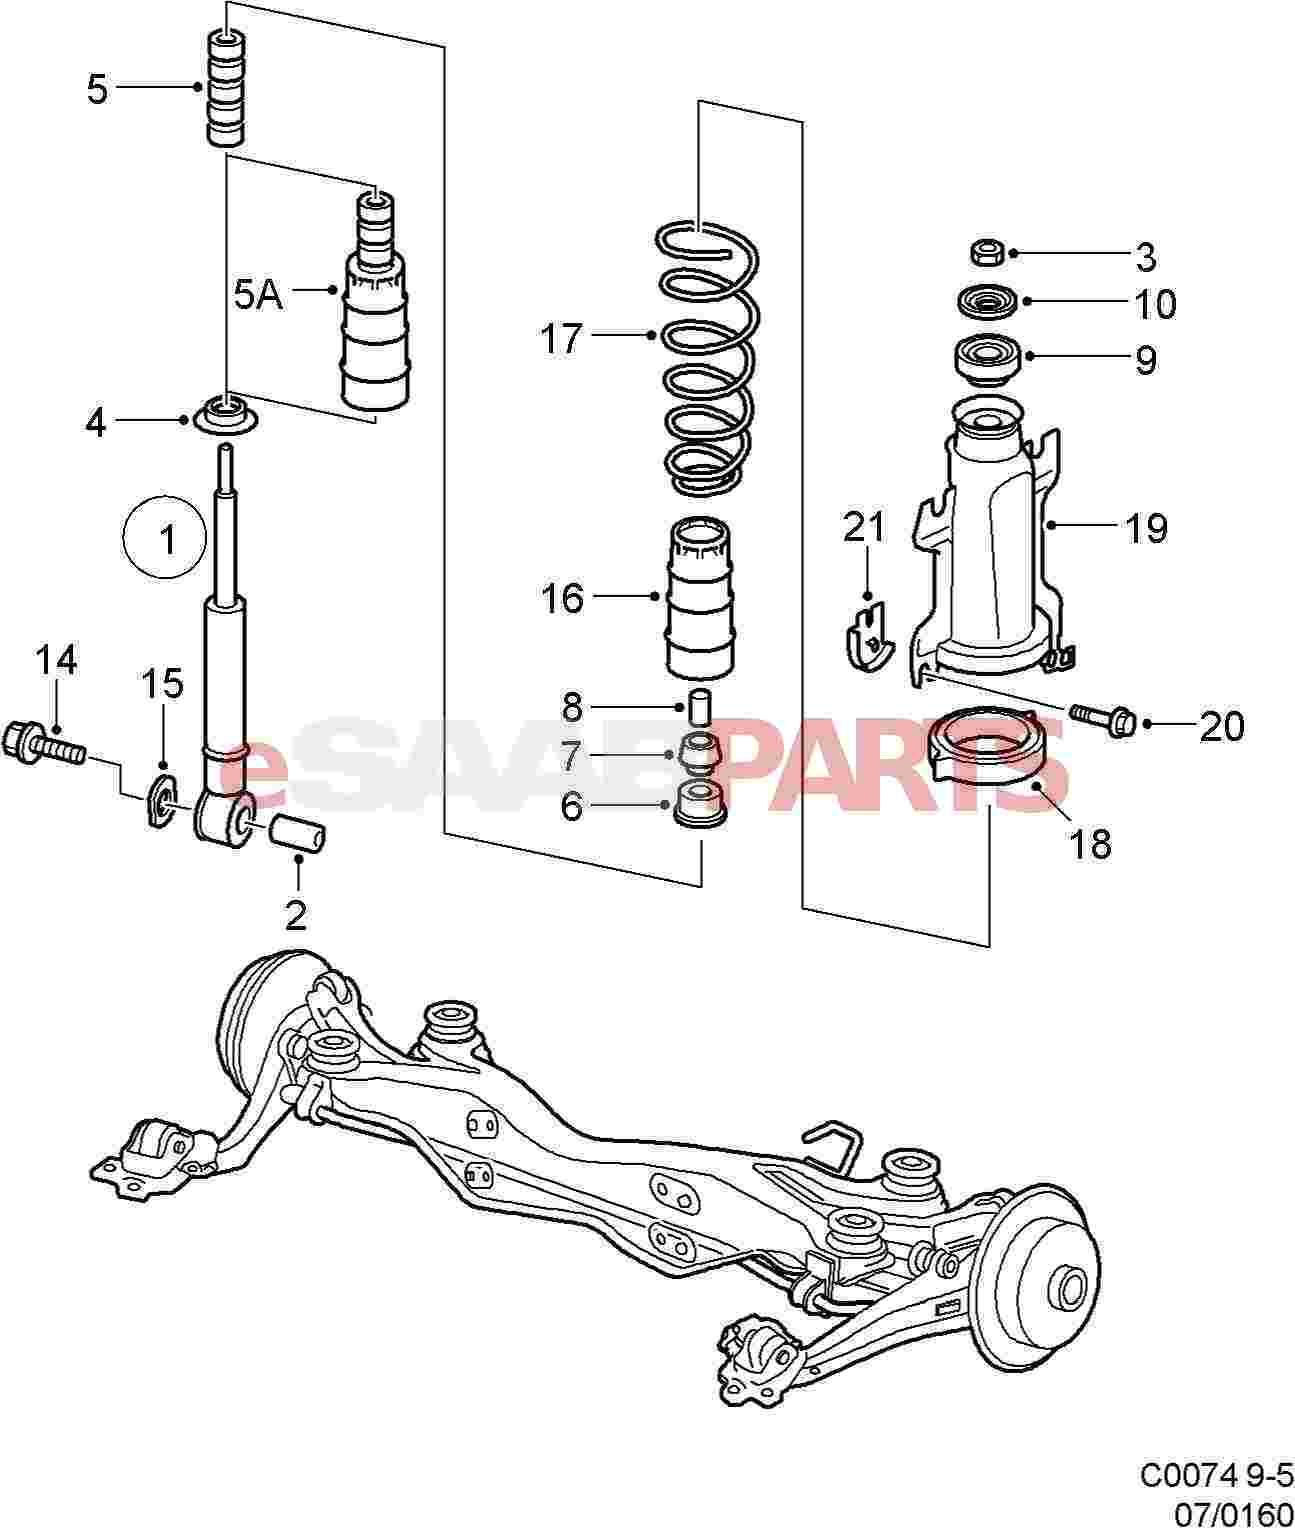 2003 Saab 9 5 Engine Diagram : 2000 Saab 9 3 Stereo Wiring